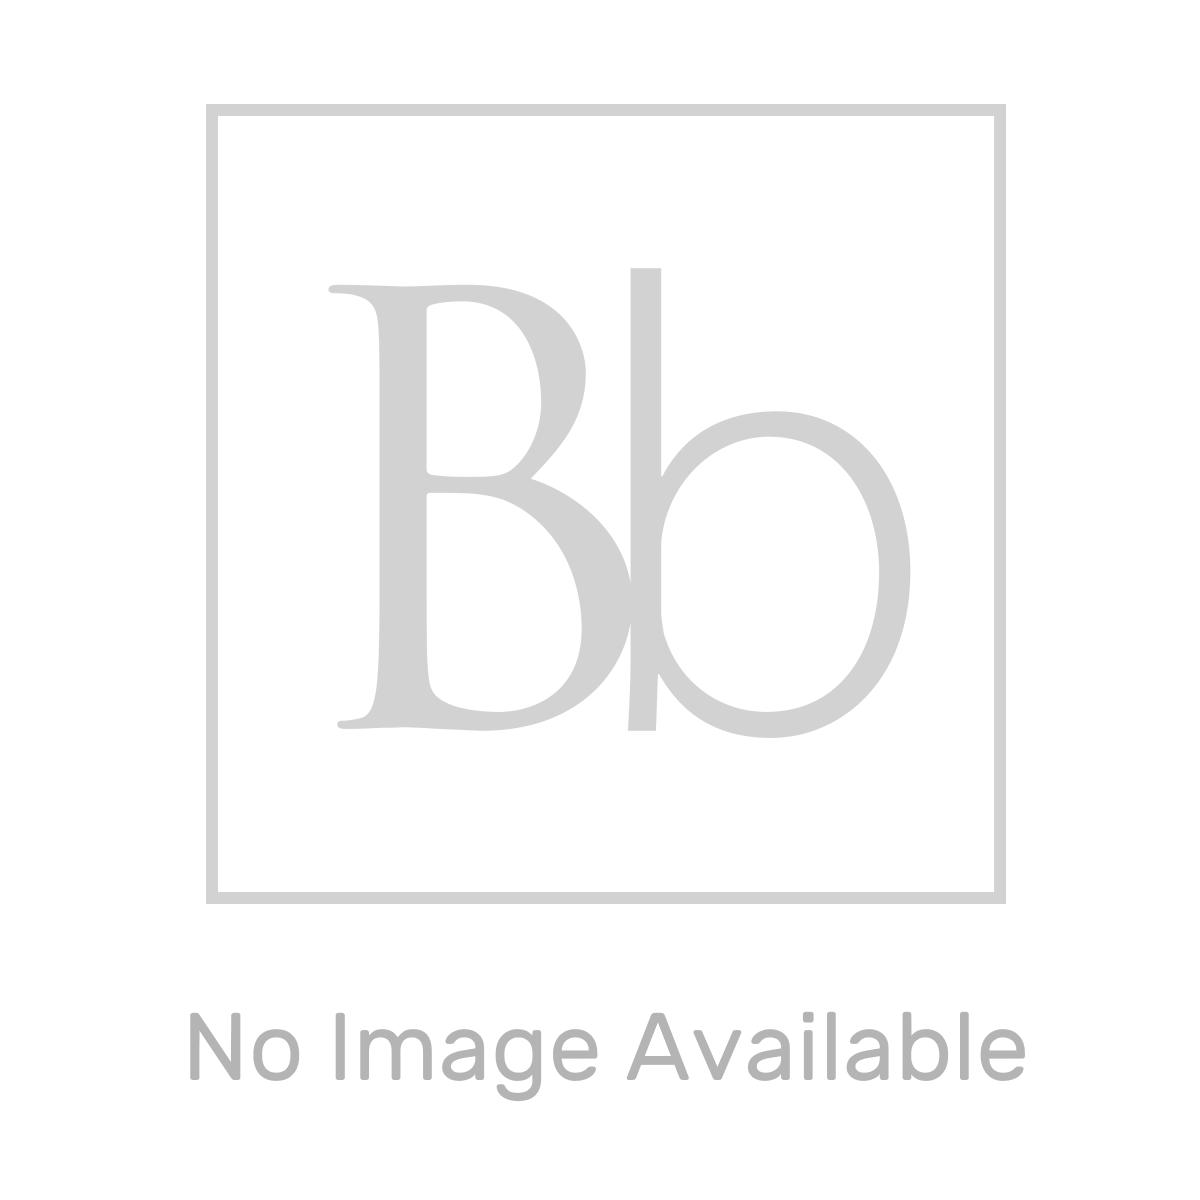 RAK Series 600 Shower Bath Suite Drawing